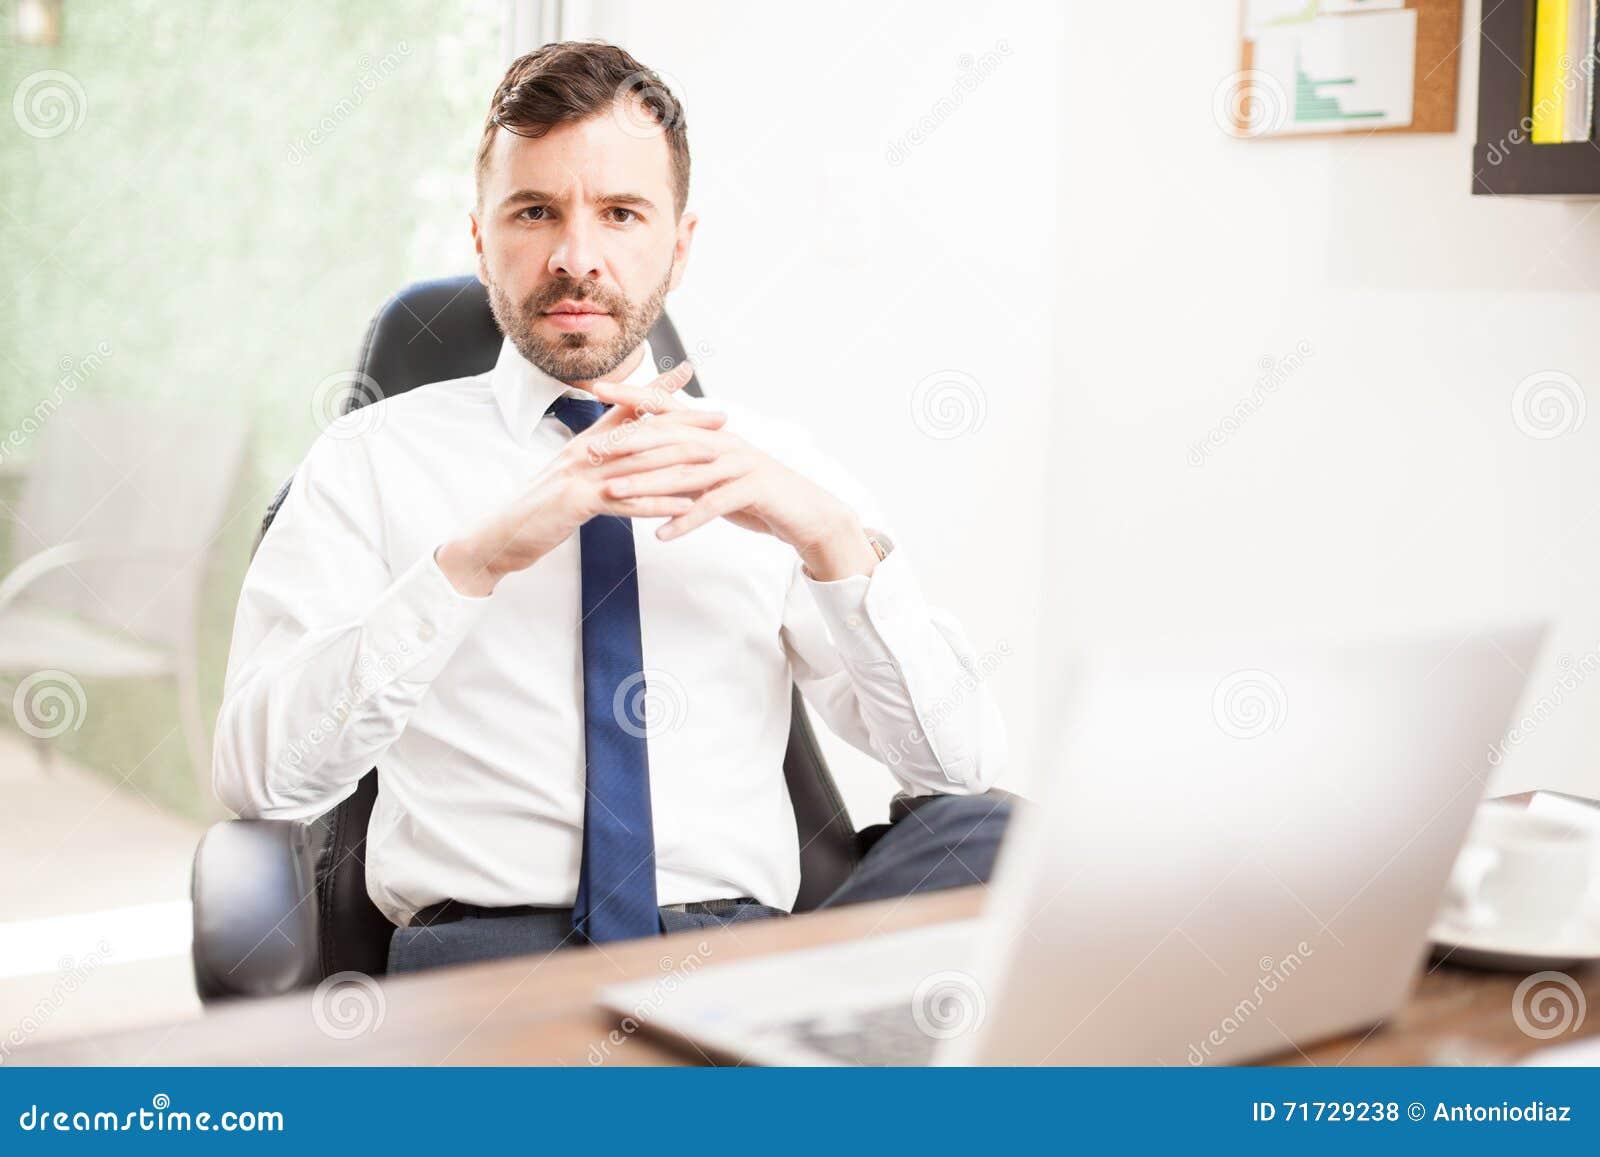 Confident Hispanic Ceo In His Office Stock Photo Image